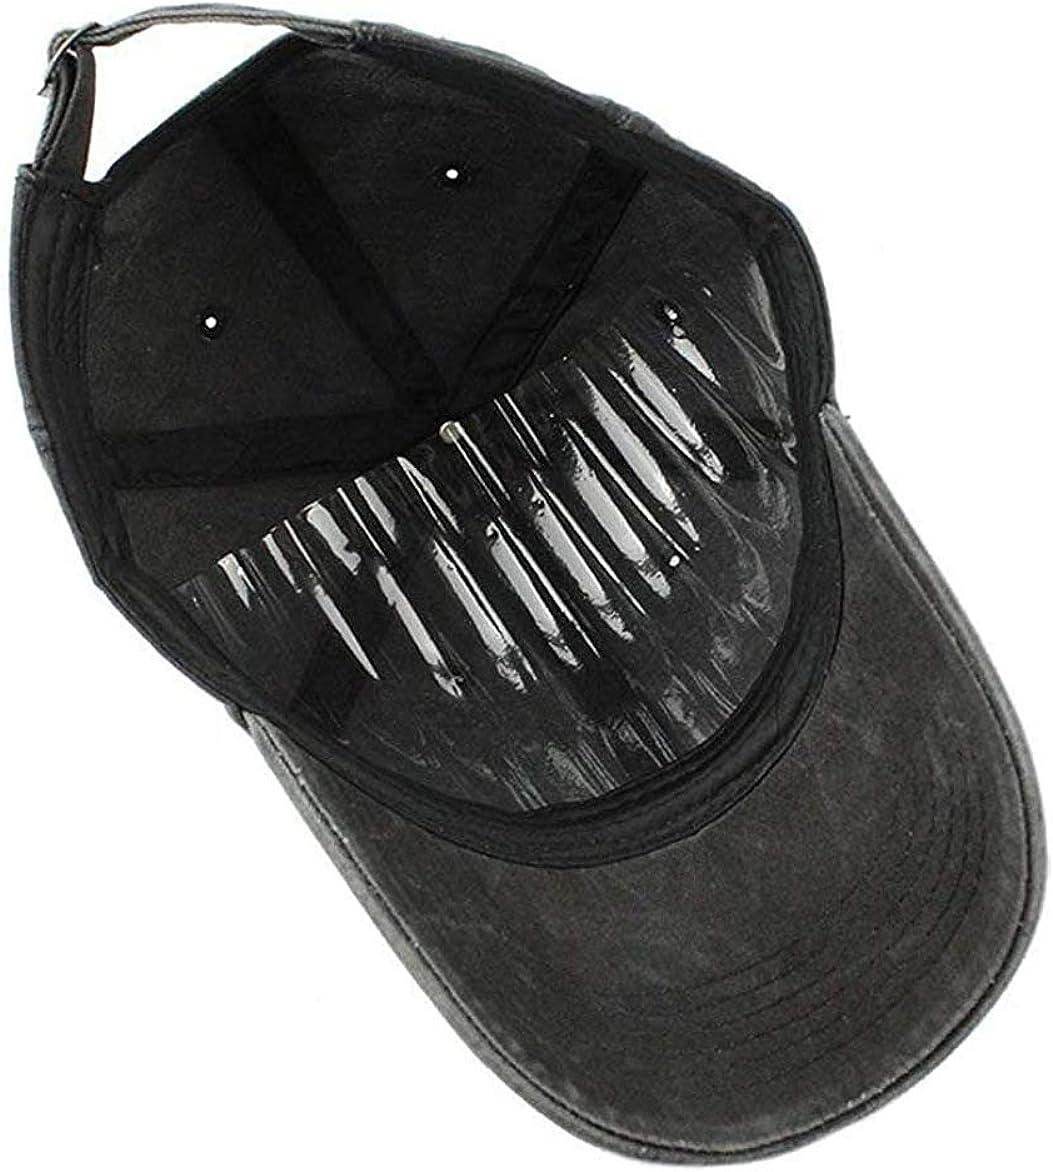 Vikings Mjolnir and Rune Wheel Norse Mythology Symbol Baseball Dad Cap Adjustable Classic Sports for Men Women Hat